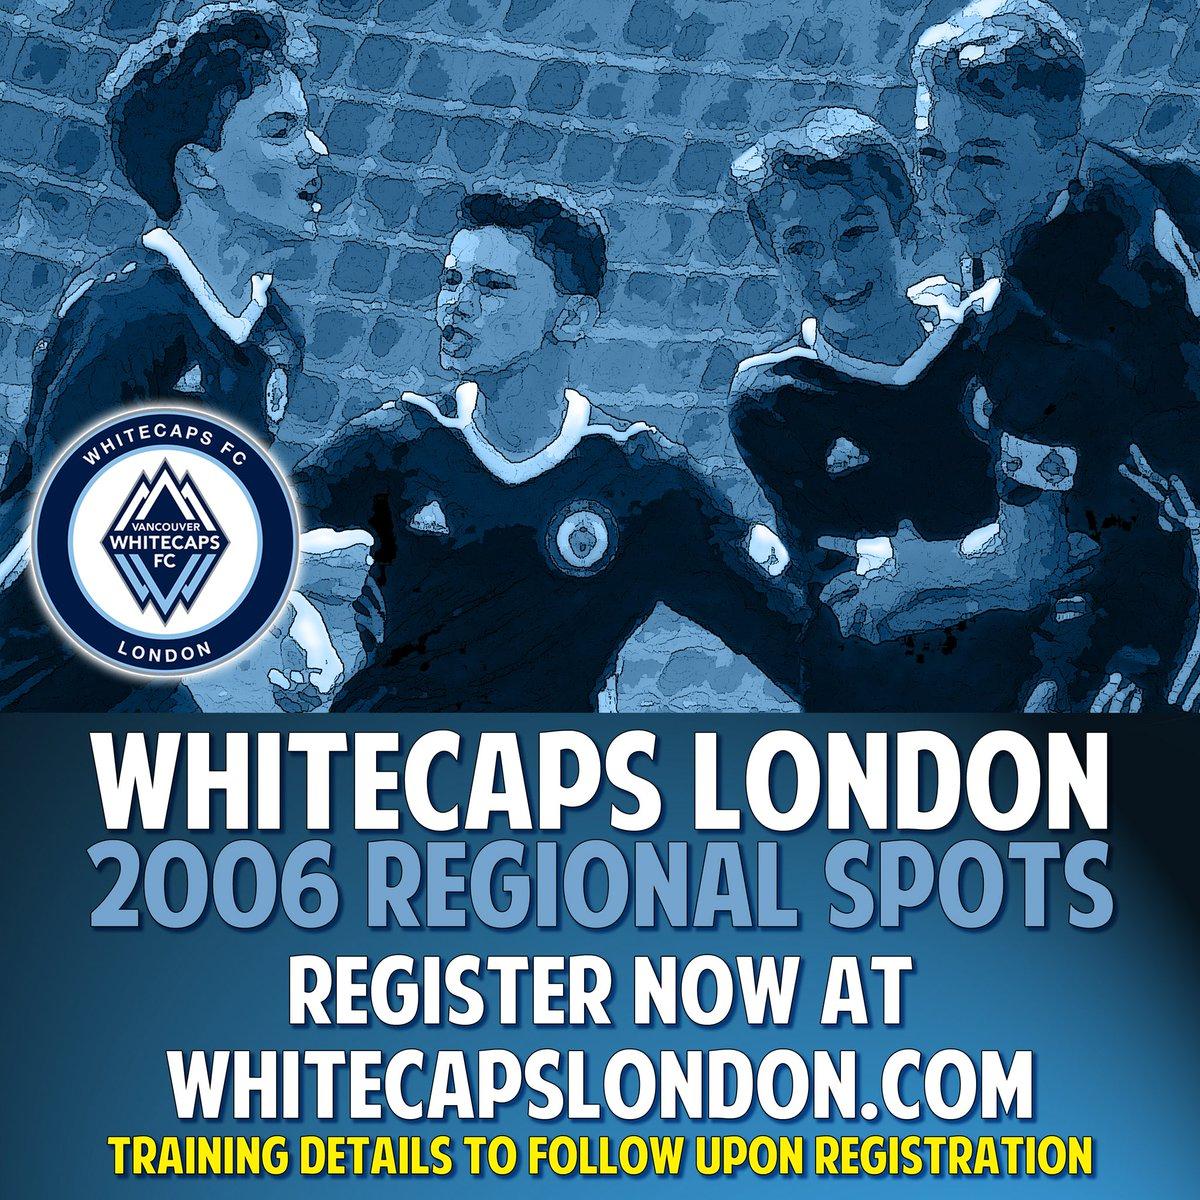 Whitecaps London - 2006 Regional Boys   ⬇️⬇️⬇️ Link for details ⬇️⬇️⬇️  http://www.whitecapslondon.com/clubs/5345/announcements/1419286-2006-REGIONAL-BOYS-TEAM…   @whitecapslondon #lndont  #ontariosoccer #playerdevelopment